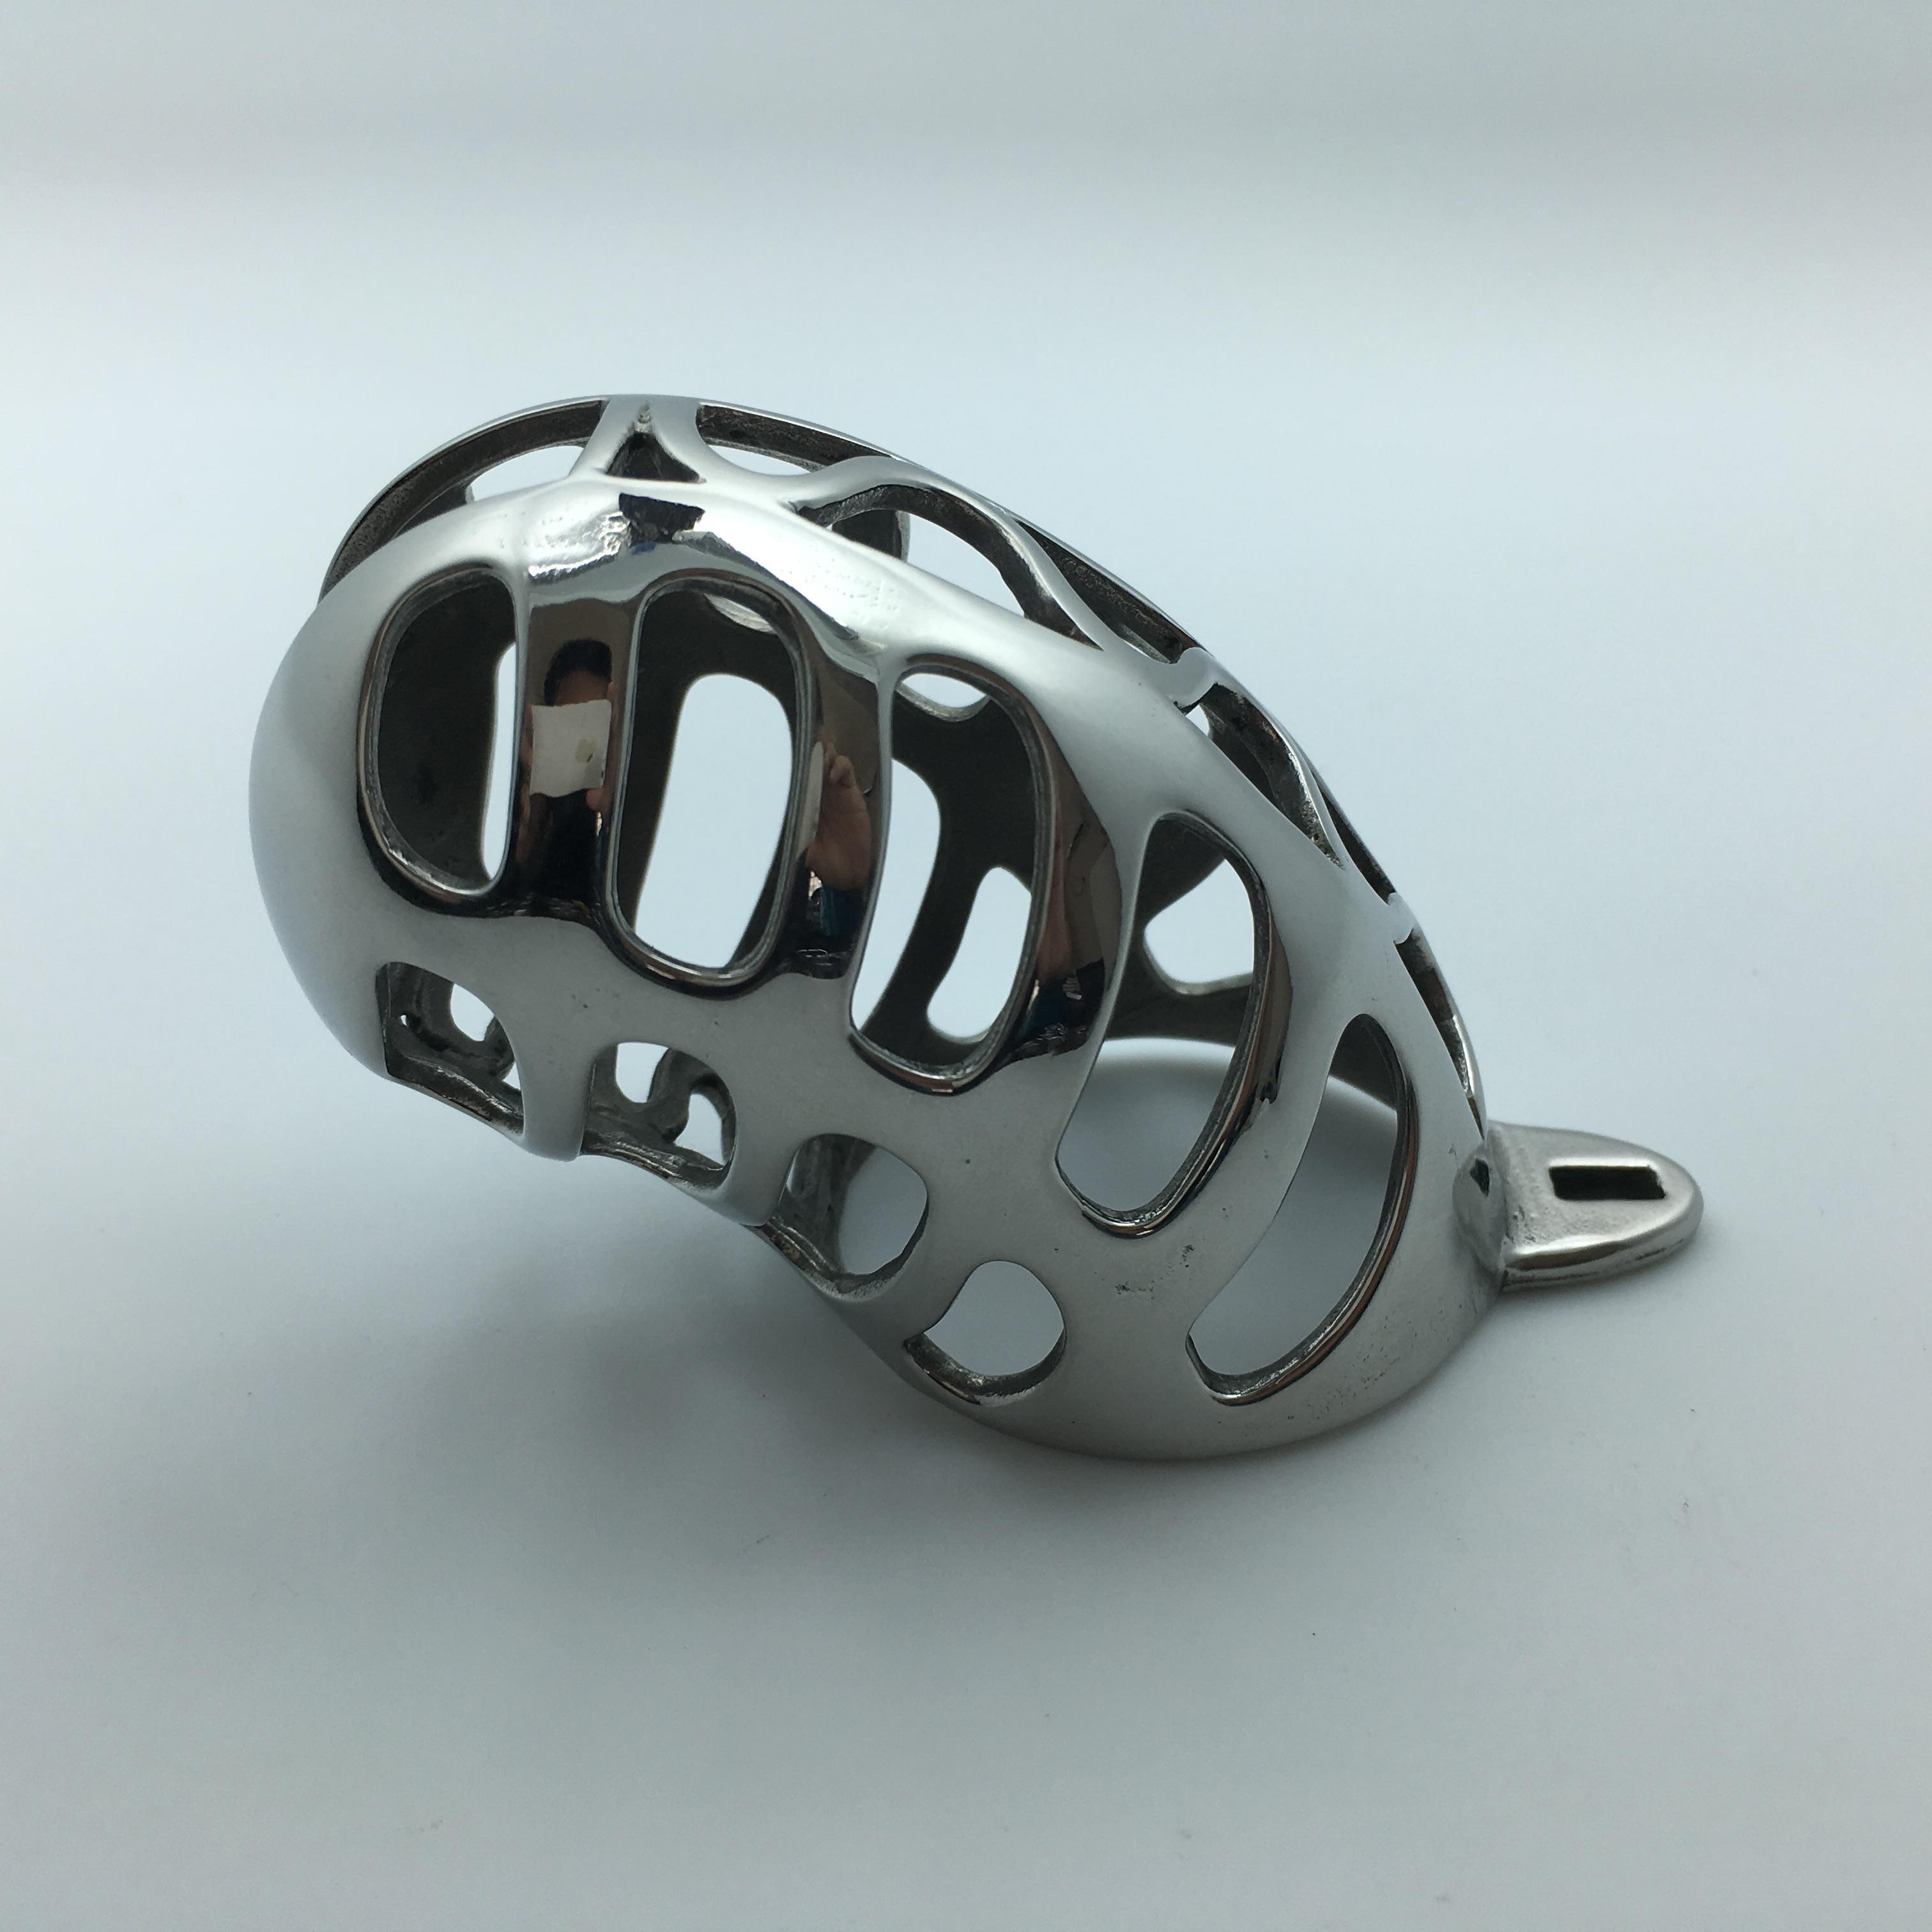 Acessórios para o dispositivo de castidade do metal / gaiola MKC007